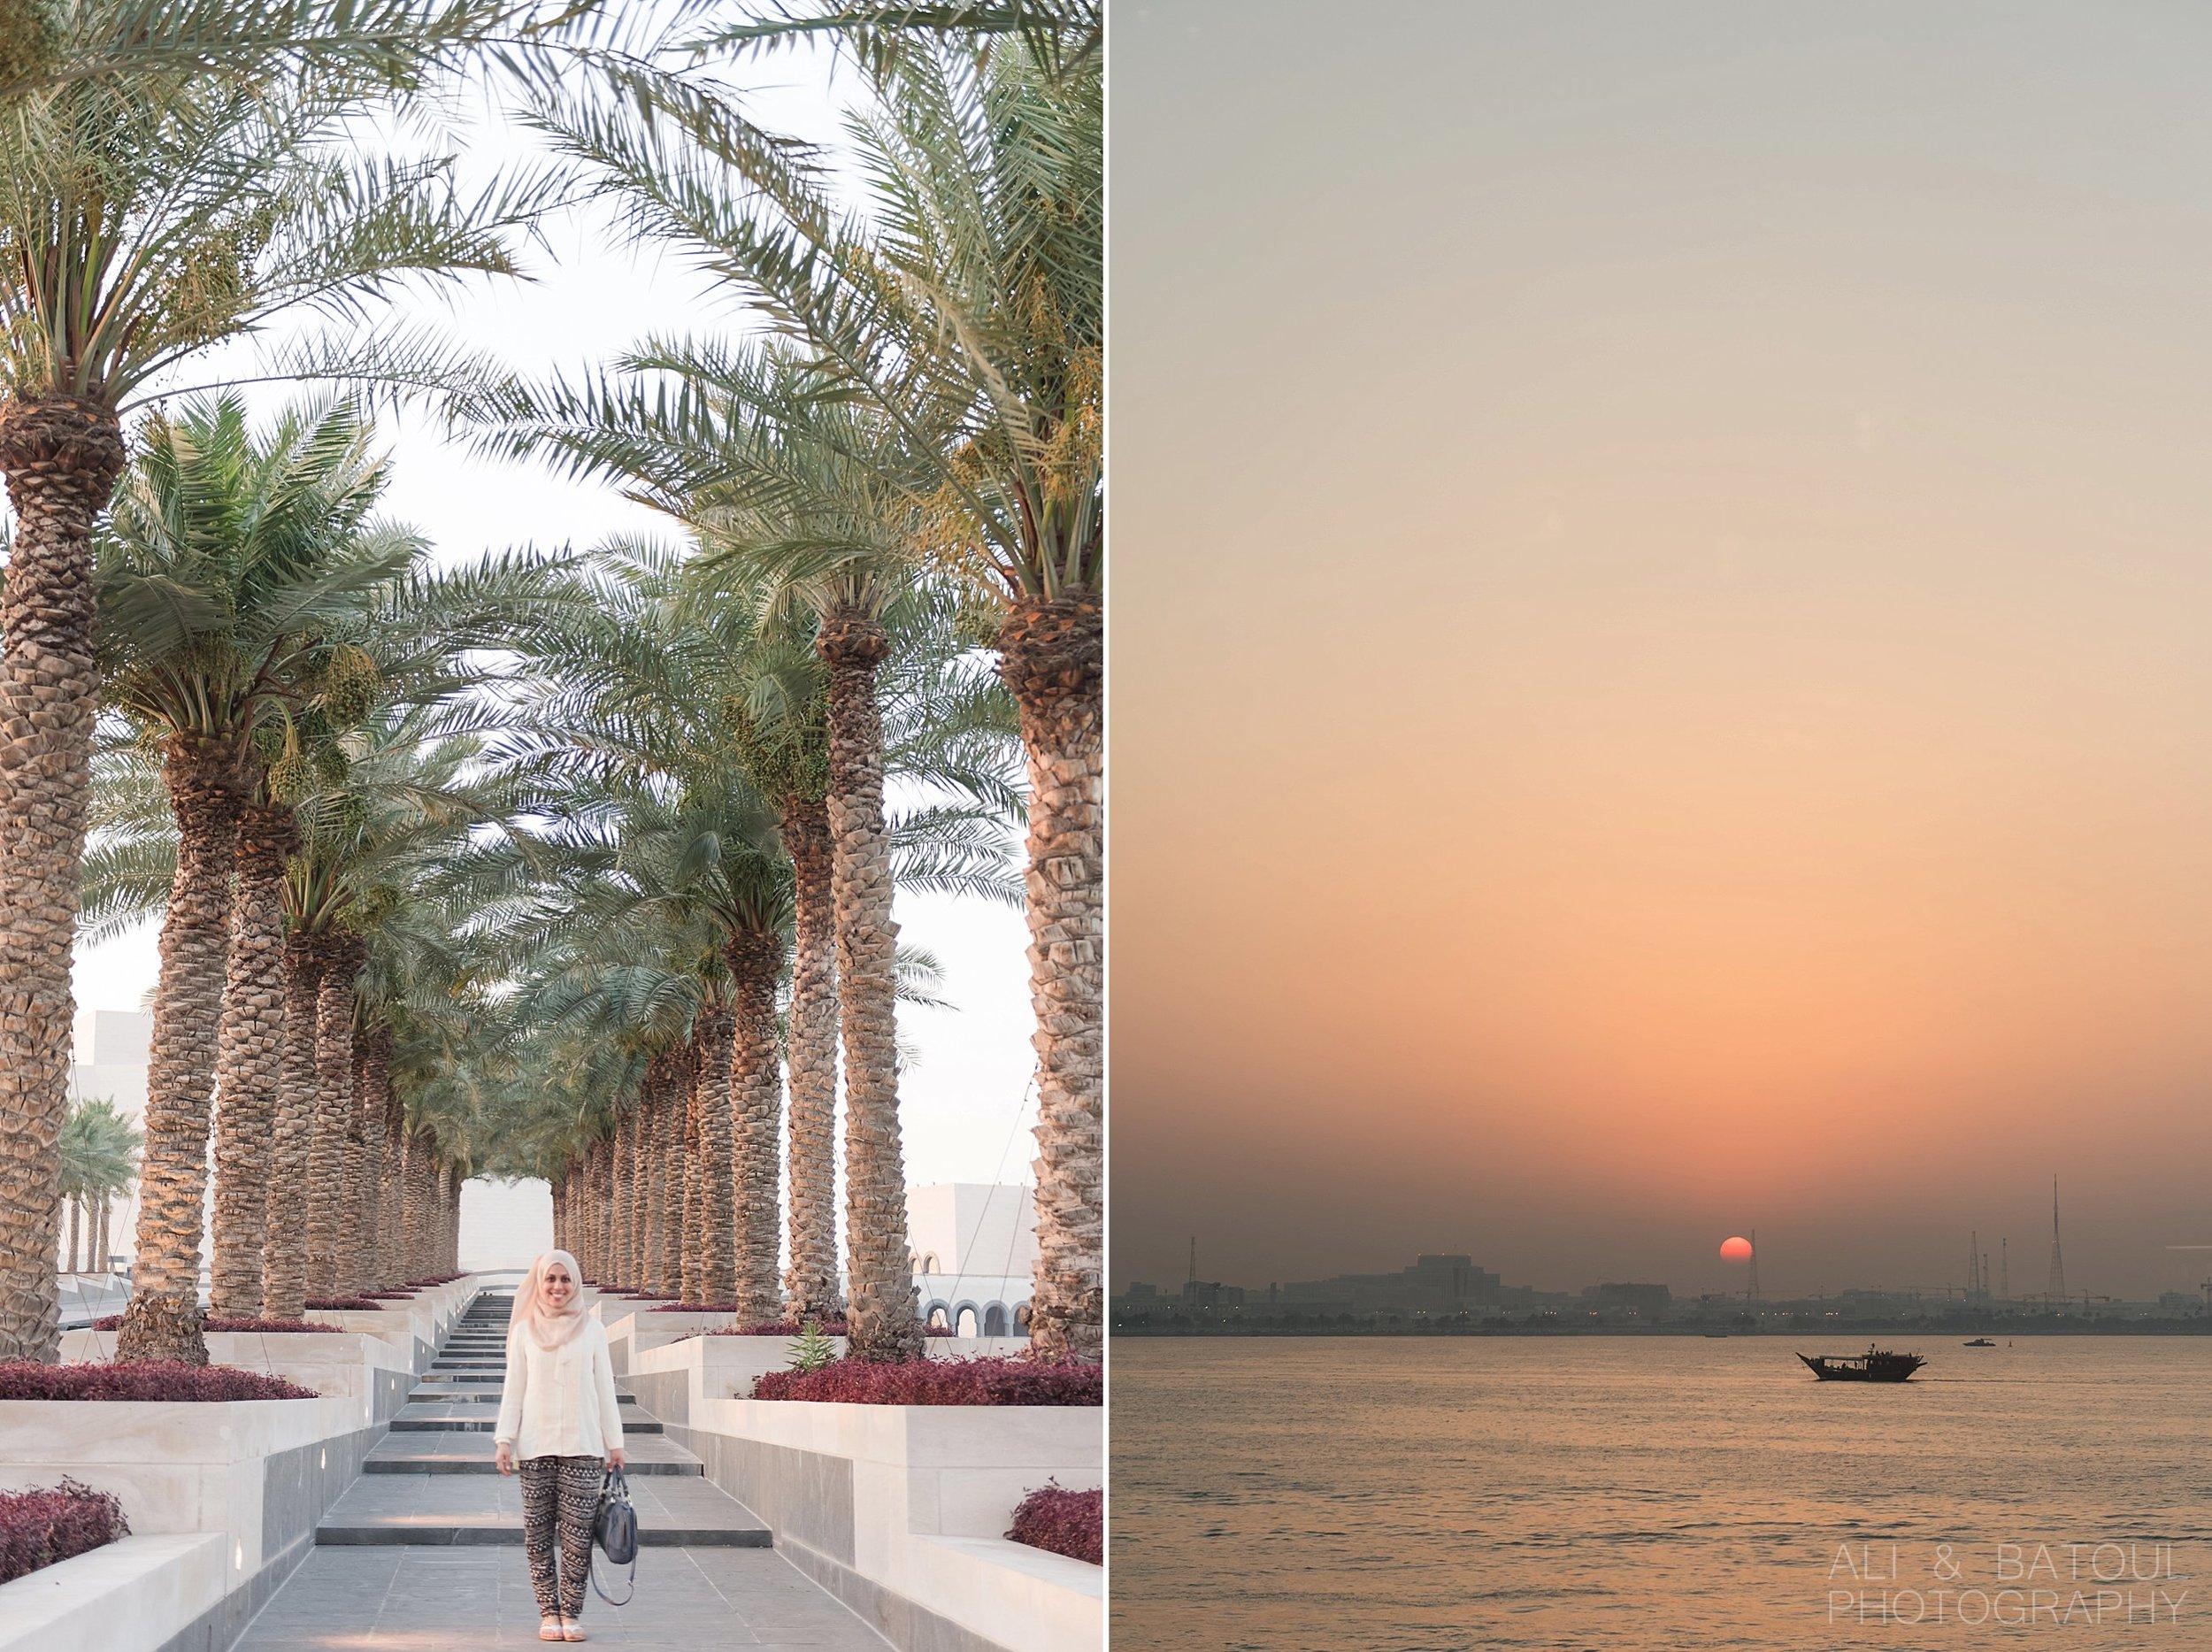 Ali & Batoul Photography - Doha Travel Photography_0001.jpg